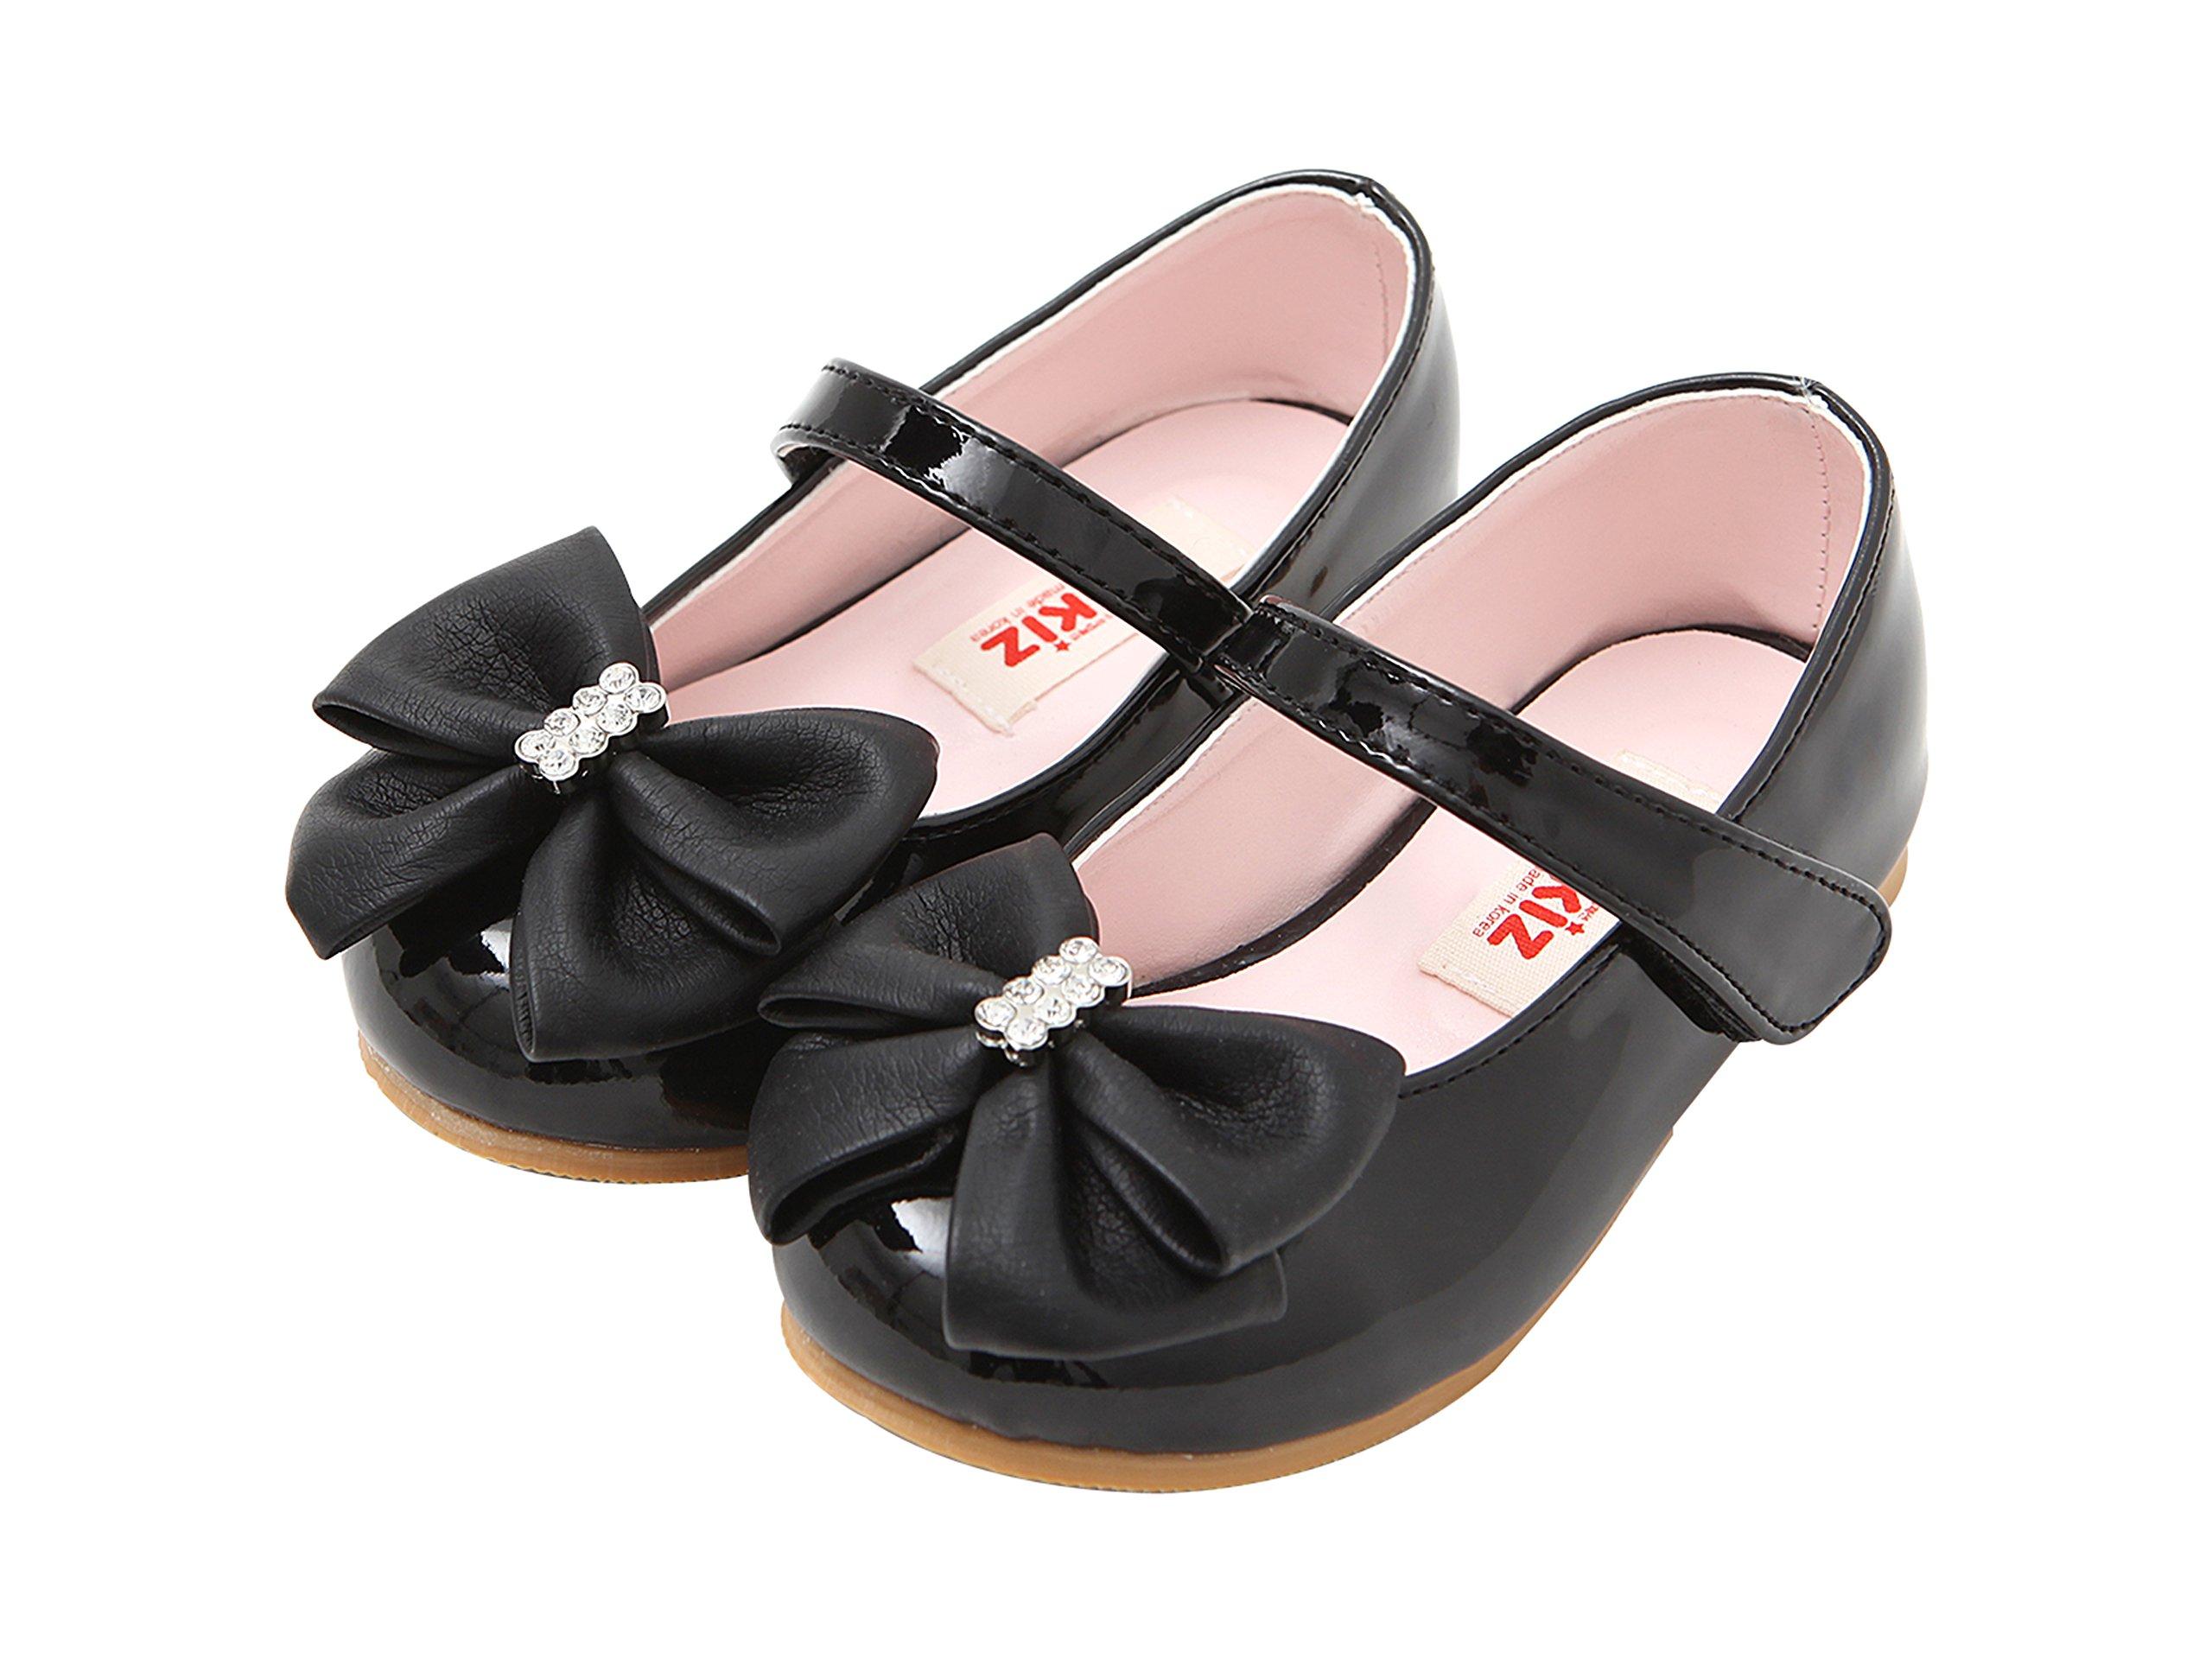 Ozkiz Girls' Dress Cubic Ribbon Polyurethane Mary Jane Flats Shoes (13 M US Little Kid, Black)